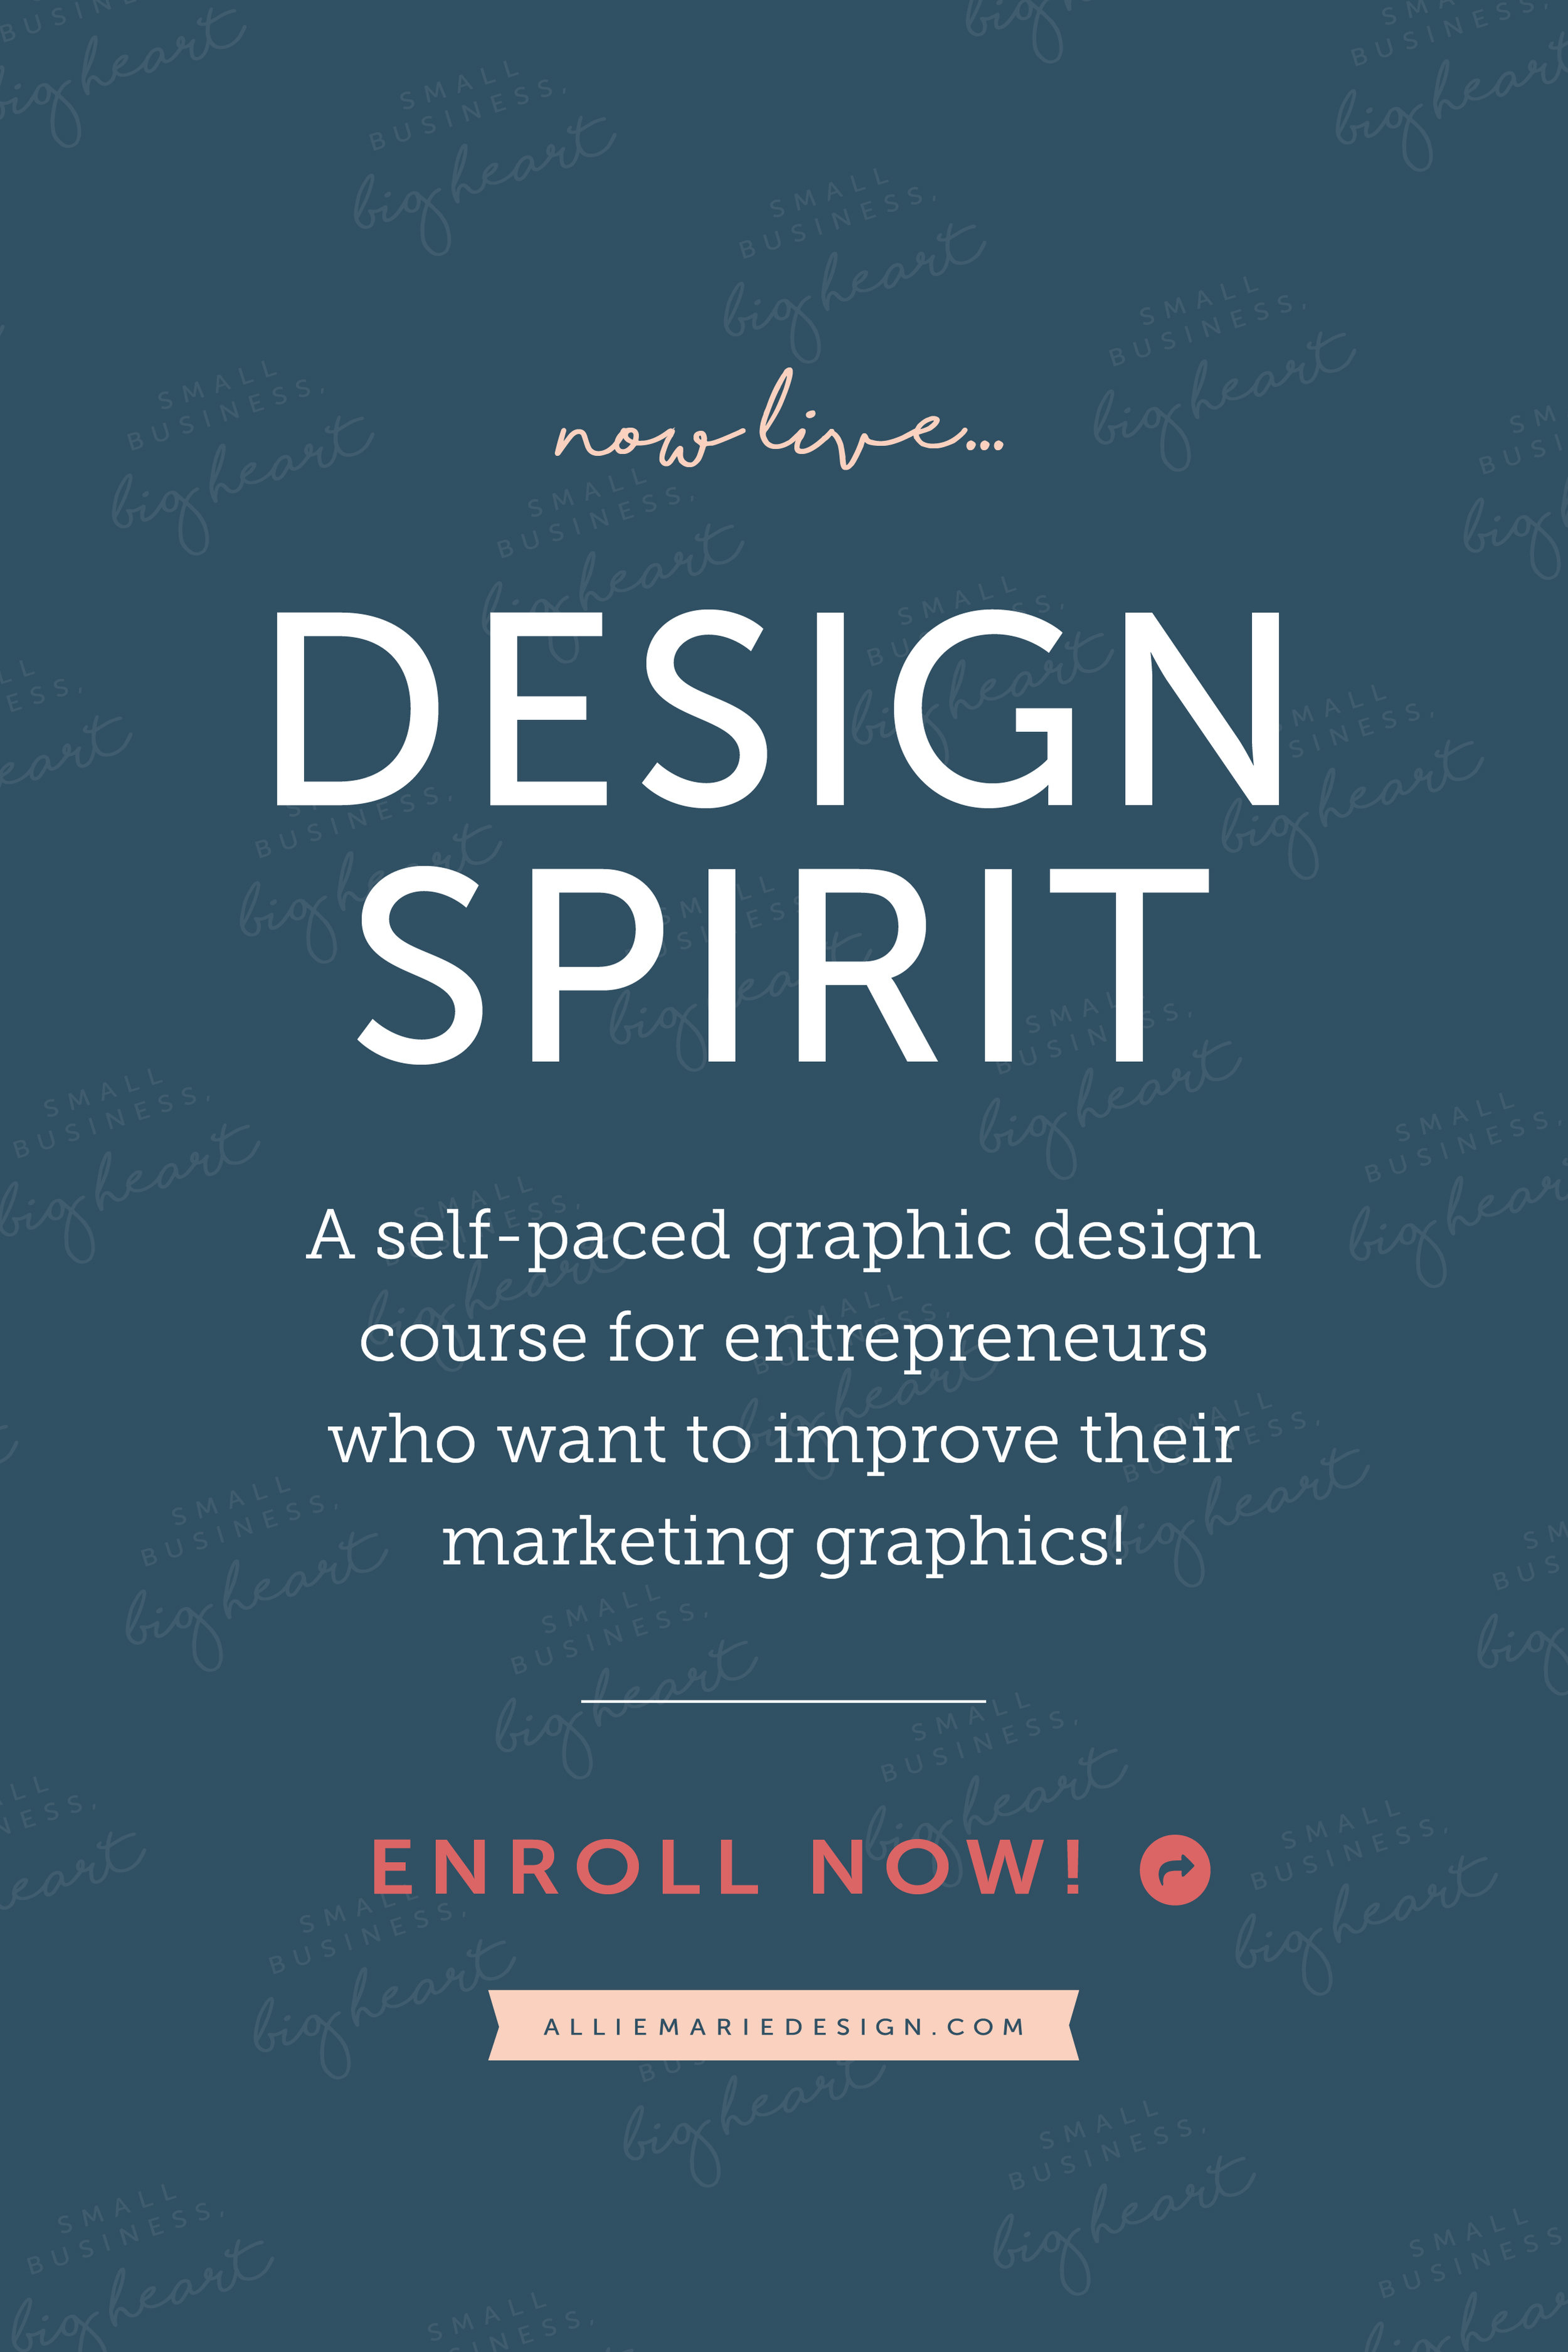 Design Spirit  |  Self-Paced Graphic Design Course for Entrepreneurs  |  AllieMarie Design